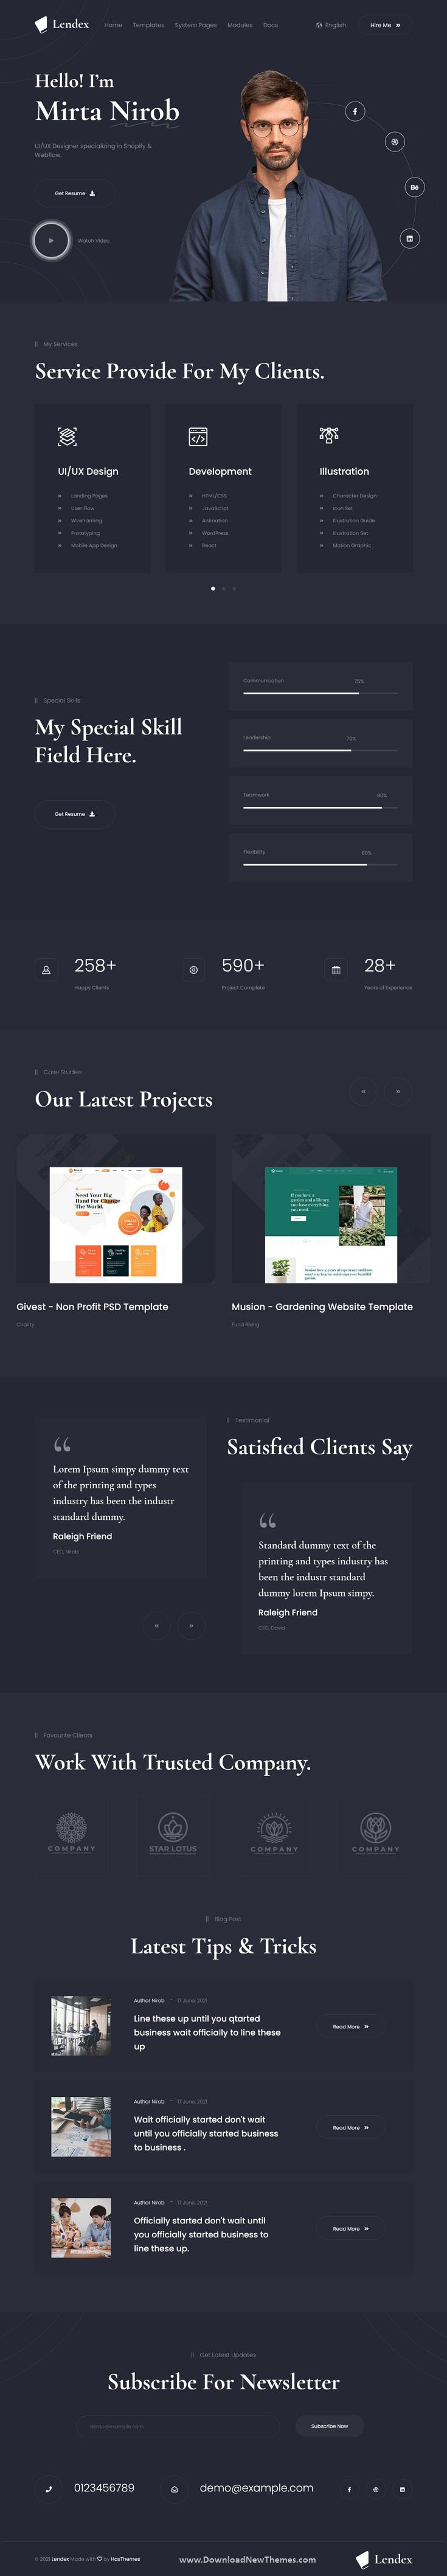 Lendex - Personal Portfolio HubSpot Theme